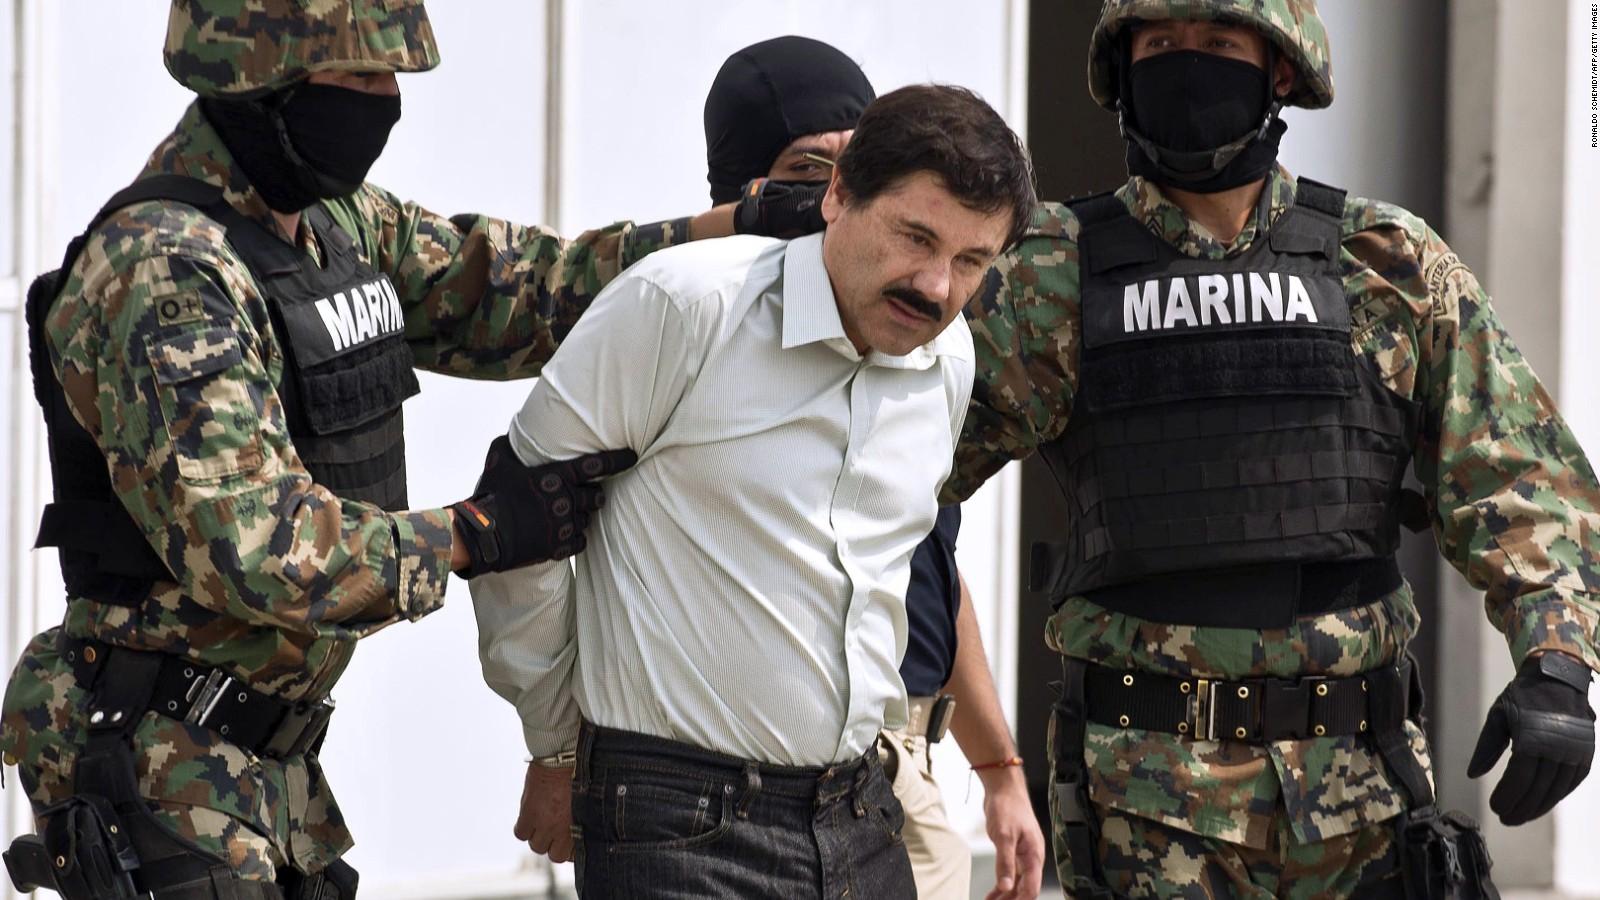 American teens killed for Mexican cartel - CNN Video